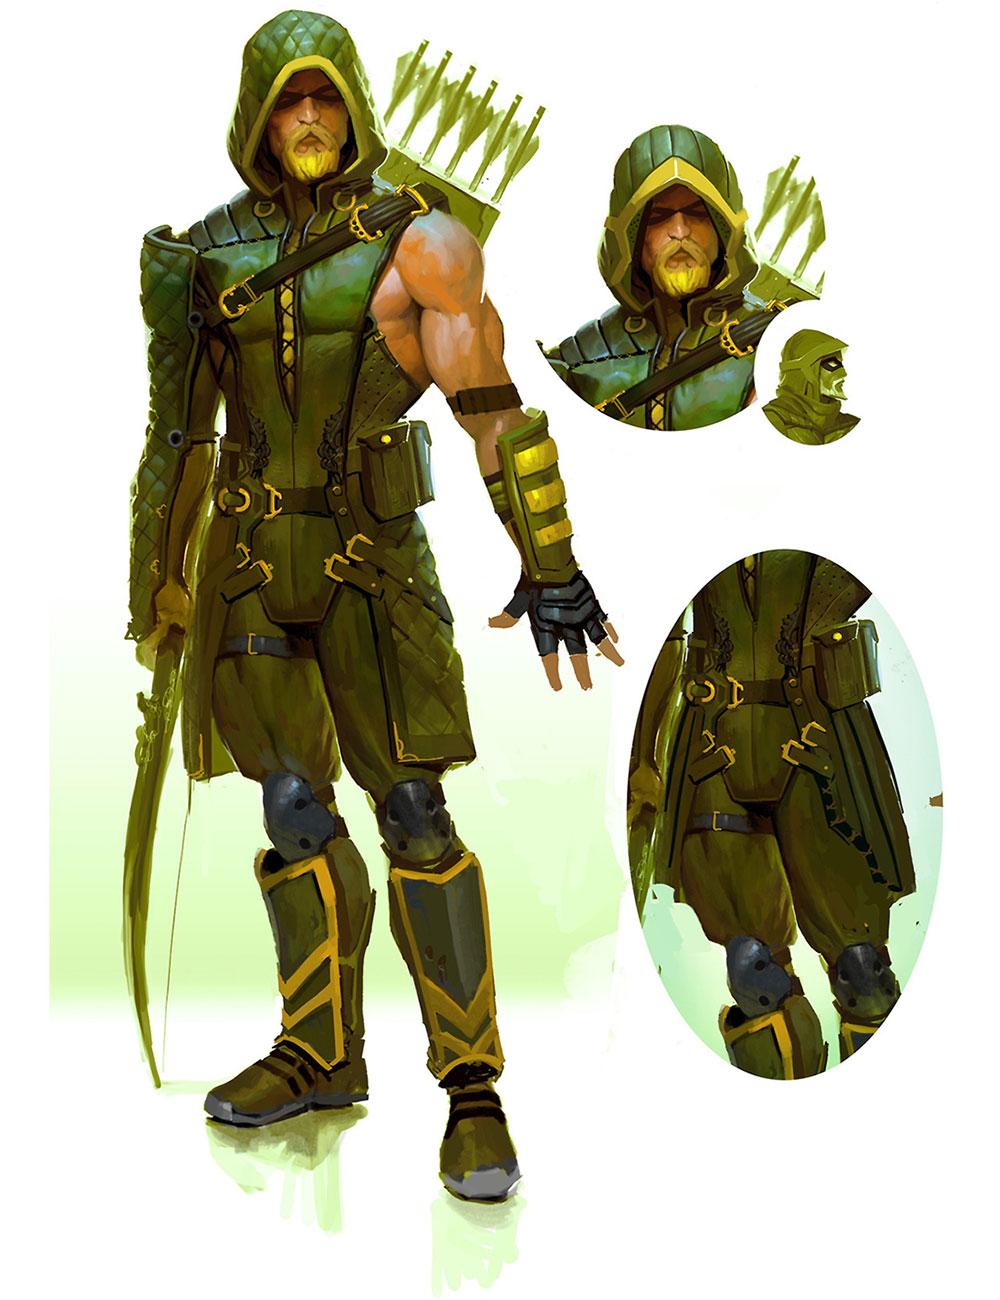 Green arrow artwork png download Green Arrow | Video Games Artwork png download